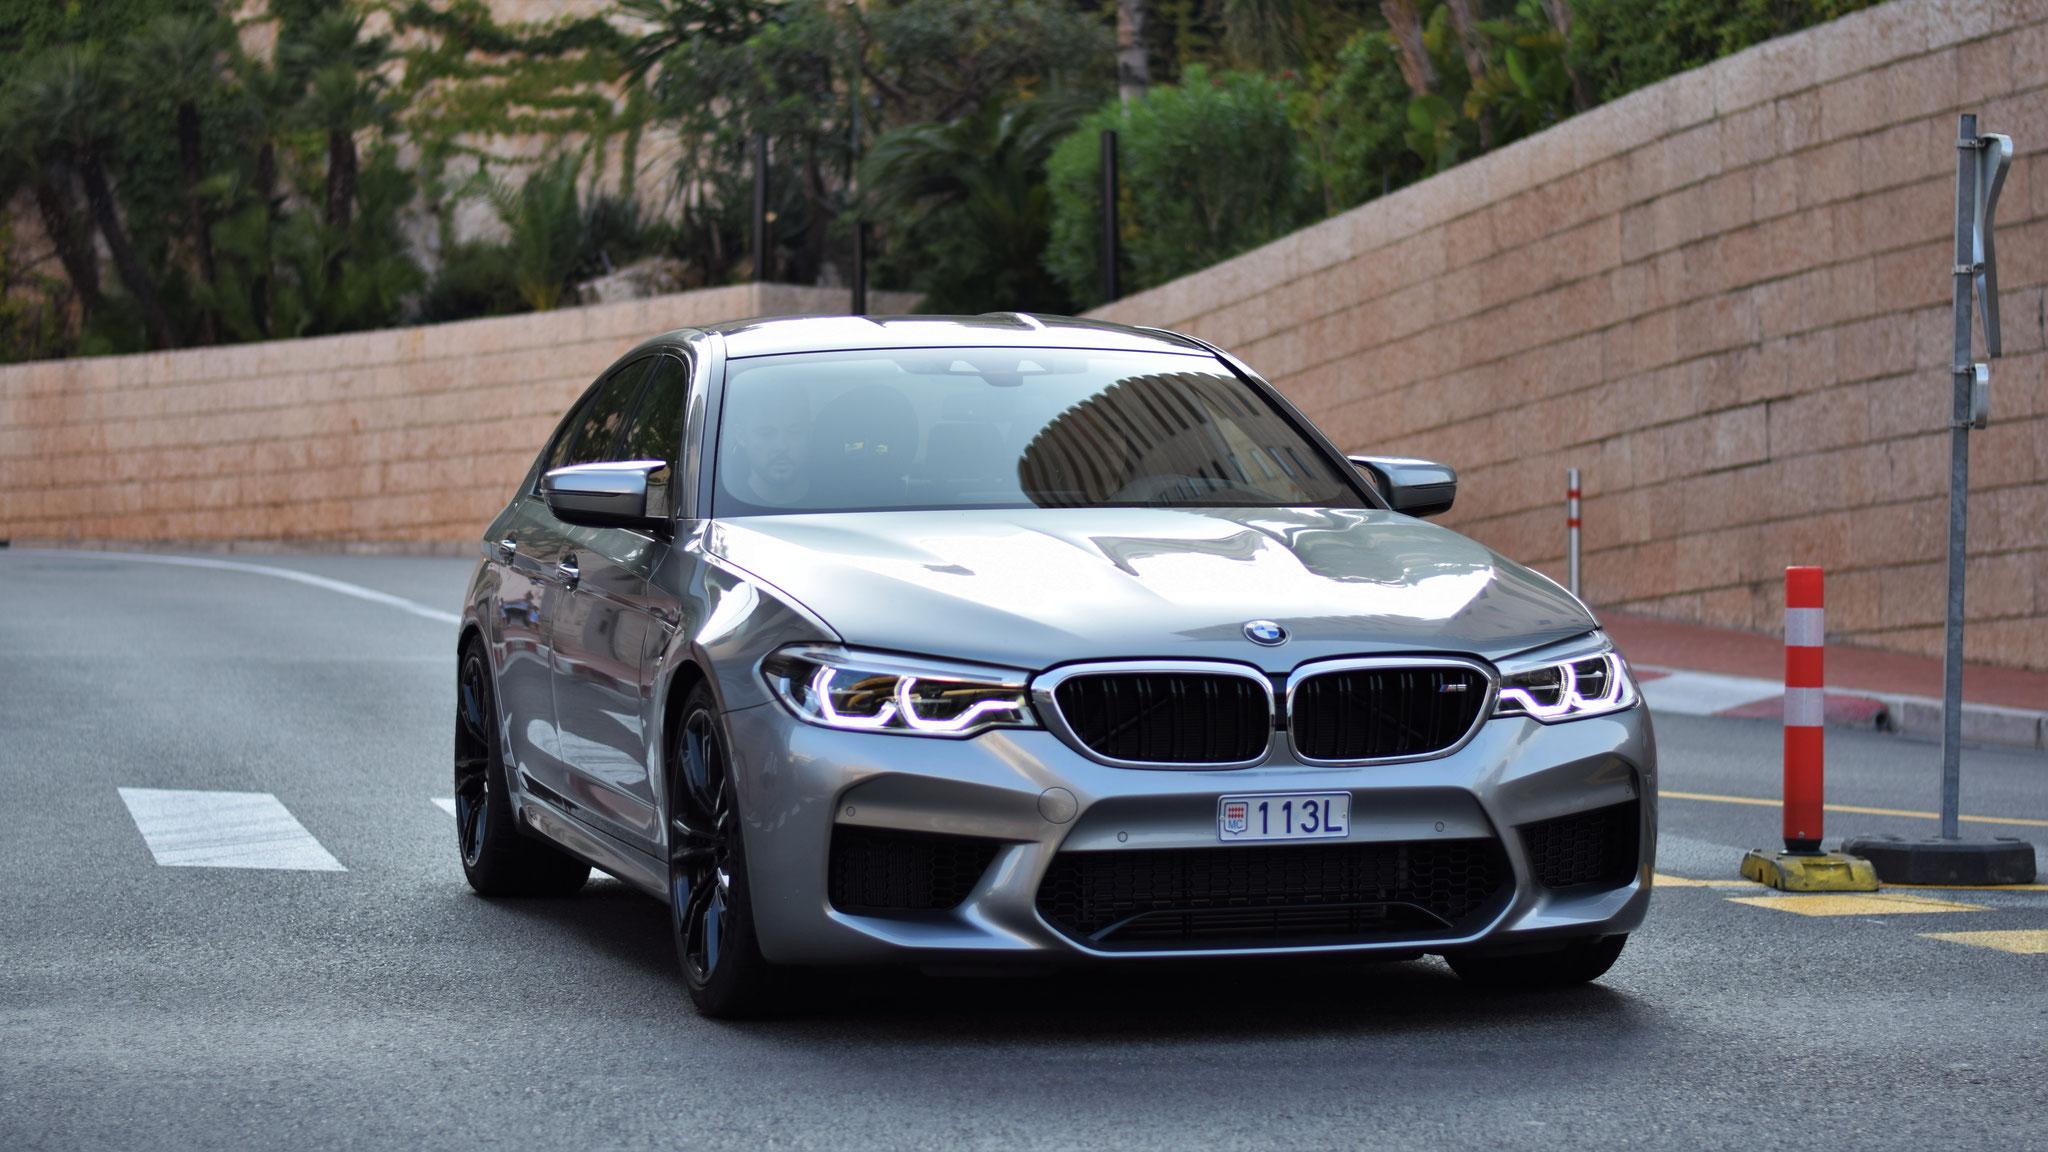 BMW M5 - 113L (MC)